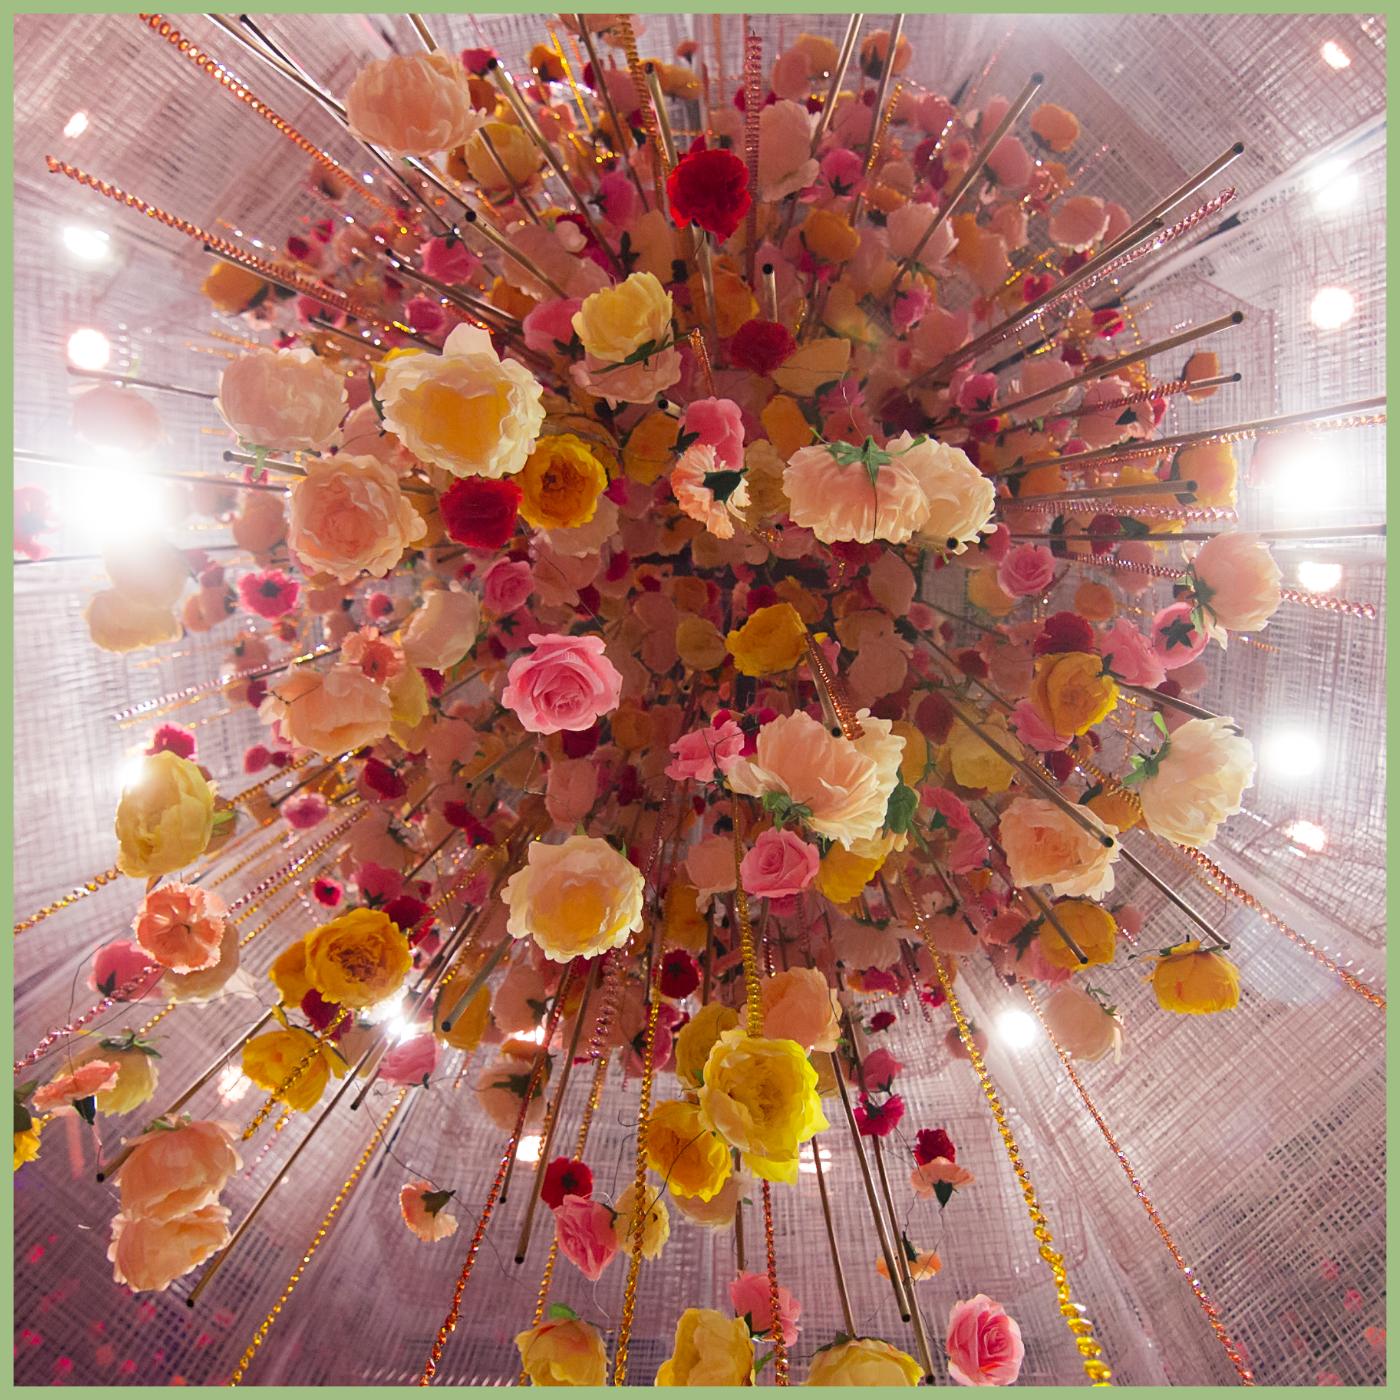 Large floral hanging installation